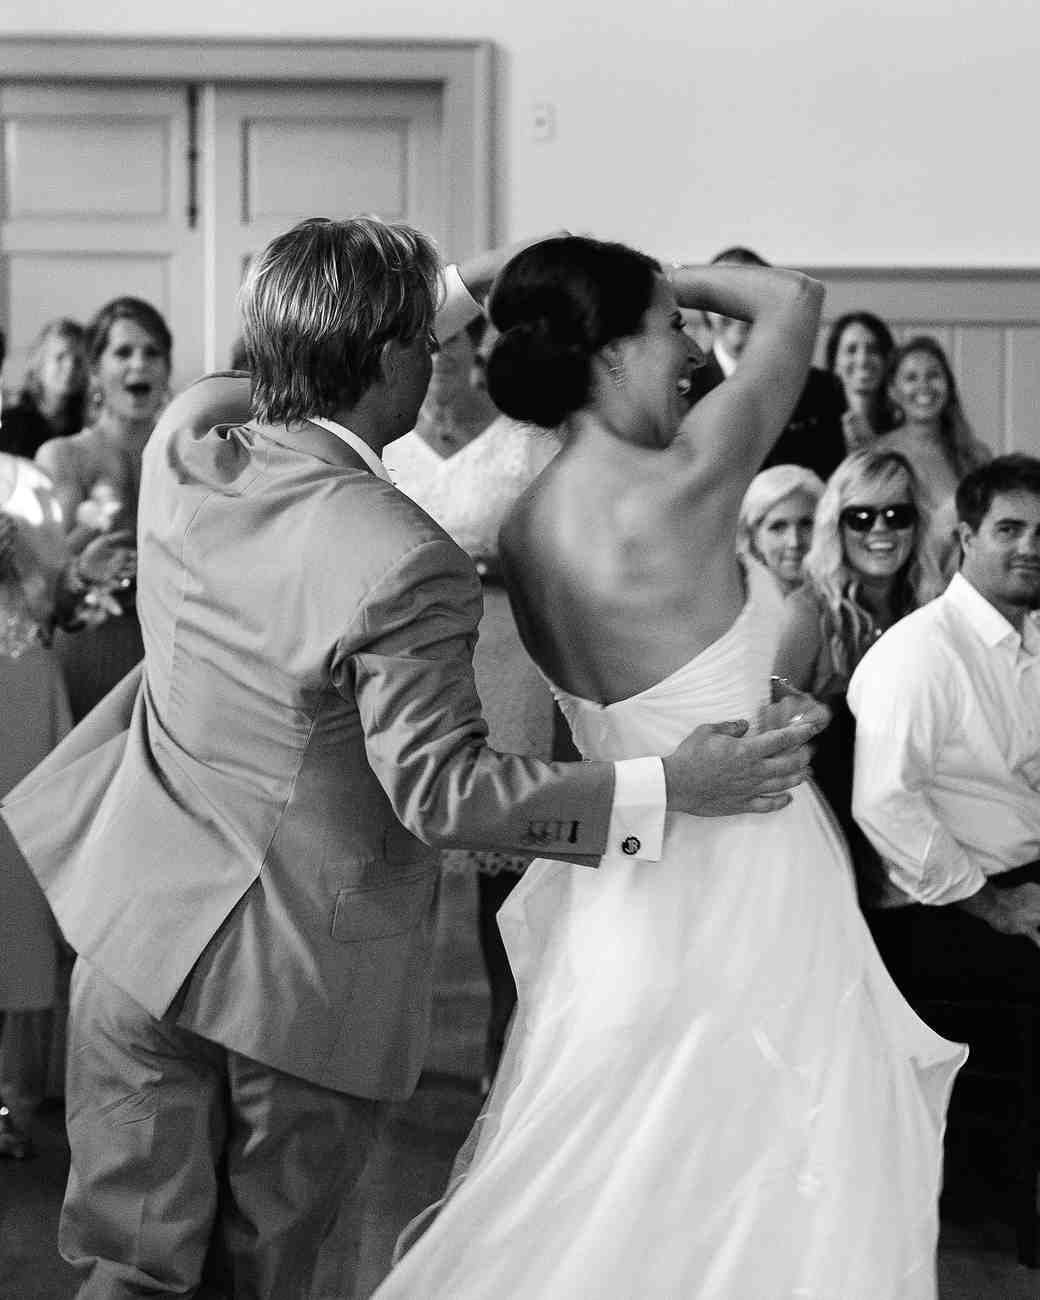 rachel-jurrie-nautical-wedding-firstdance-0931-s112778-0416.jpg